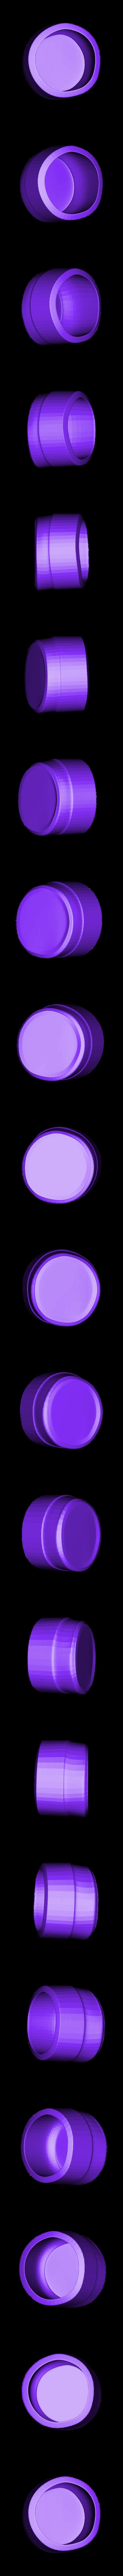 Lucio_hoseMntD_rgt.stl Download free STL file Overwatch Lucio Blaster • 3D printer object, Adafruit